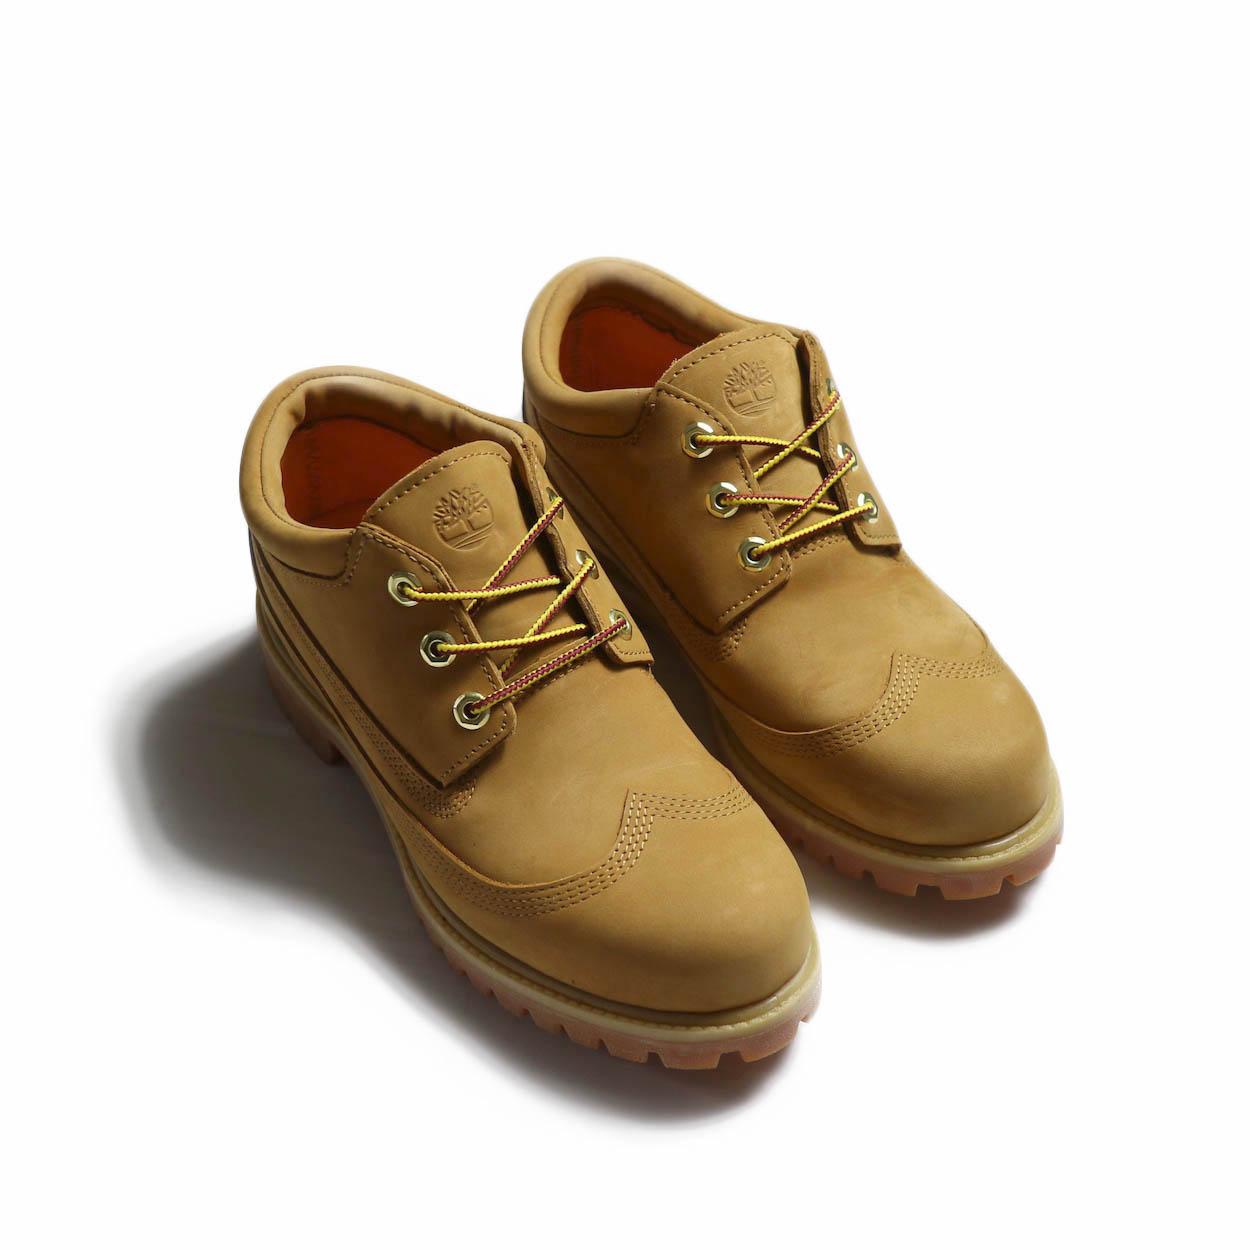 Engineered Garments × Timberland EG Special - Mid Wing Boot (Navy)Engineered Garments × Timberland EG Special - Mid Wing Boot (Wheat)